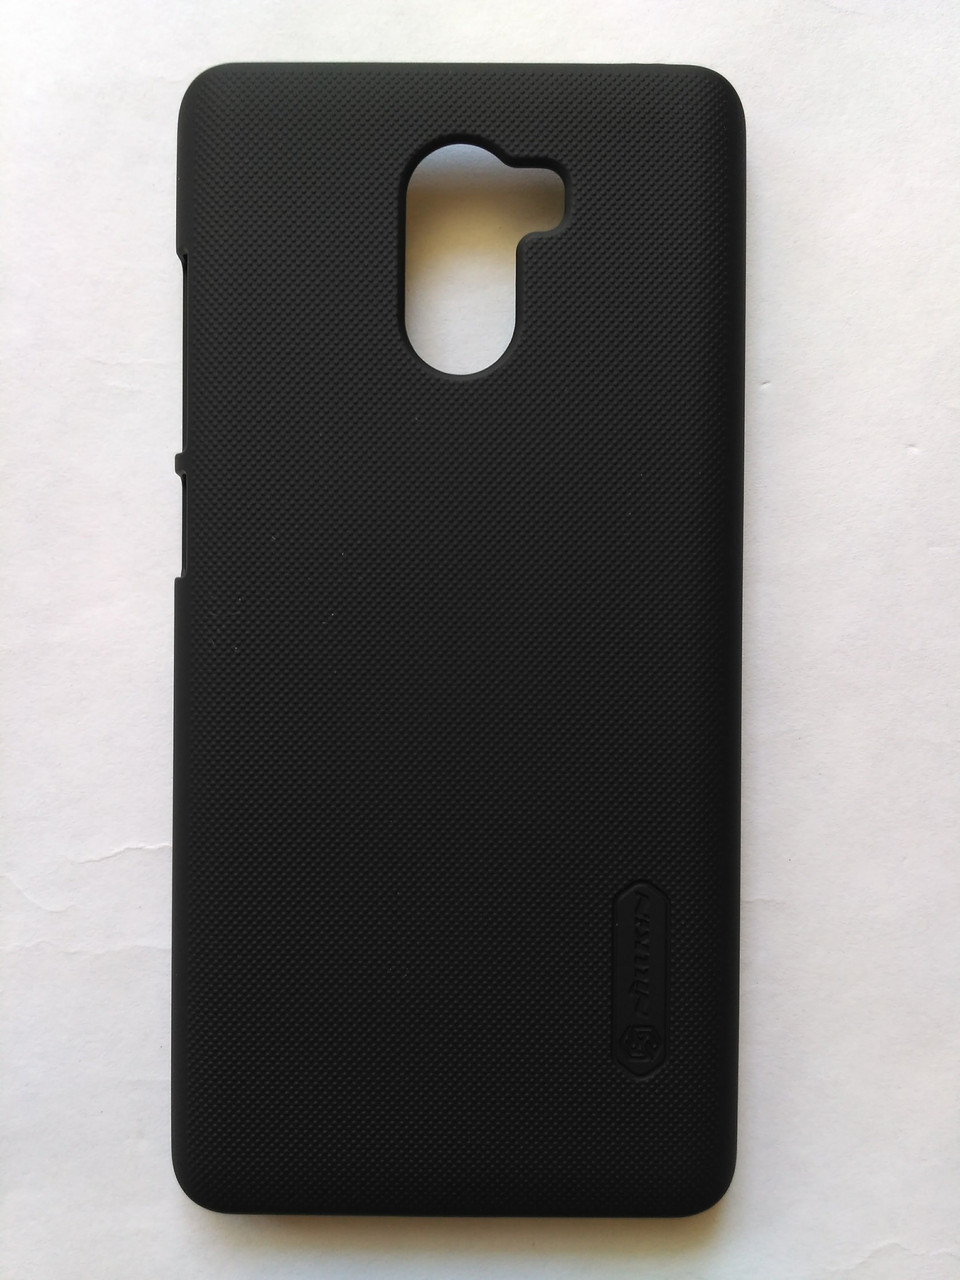 Nillkin Frosted черный для Xiaomi Redmi 4 standart